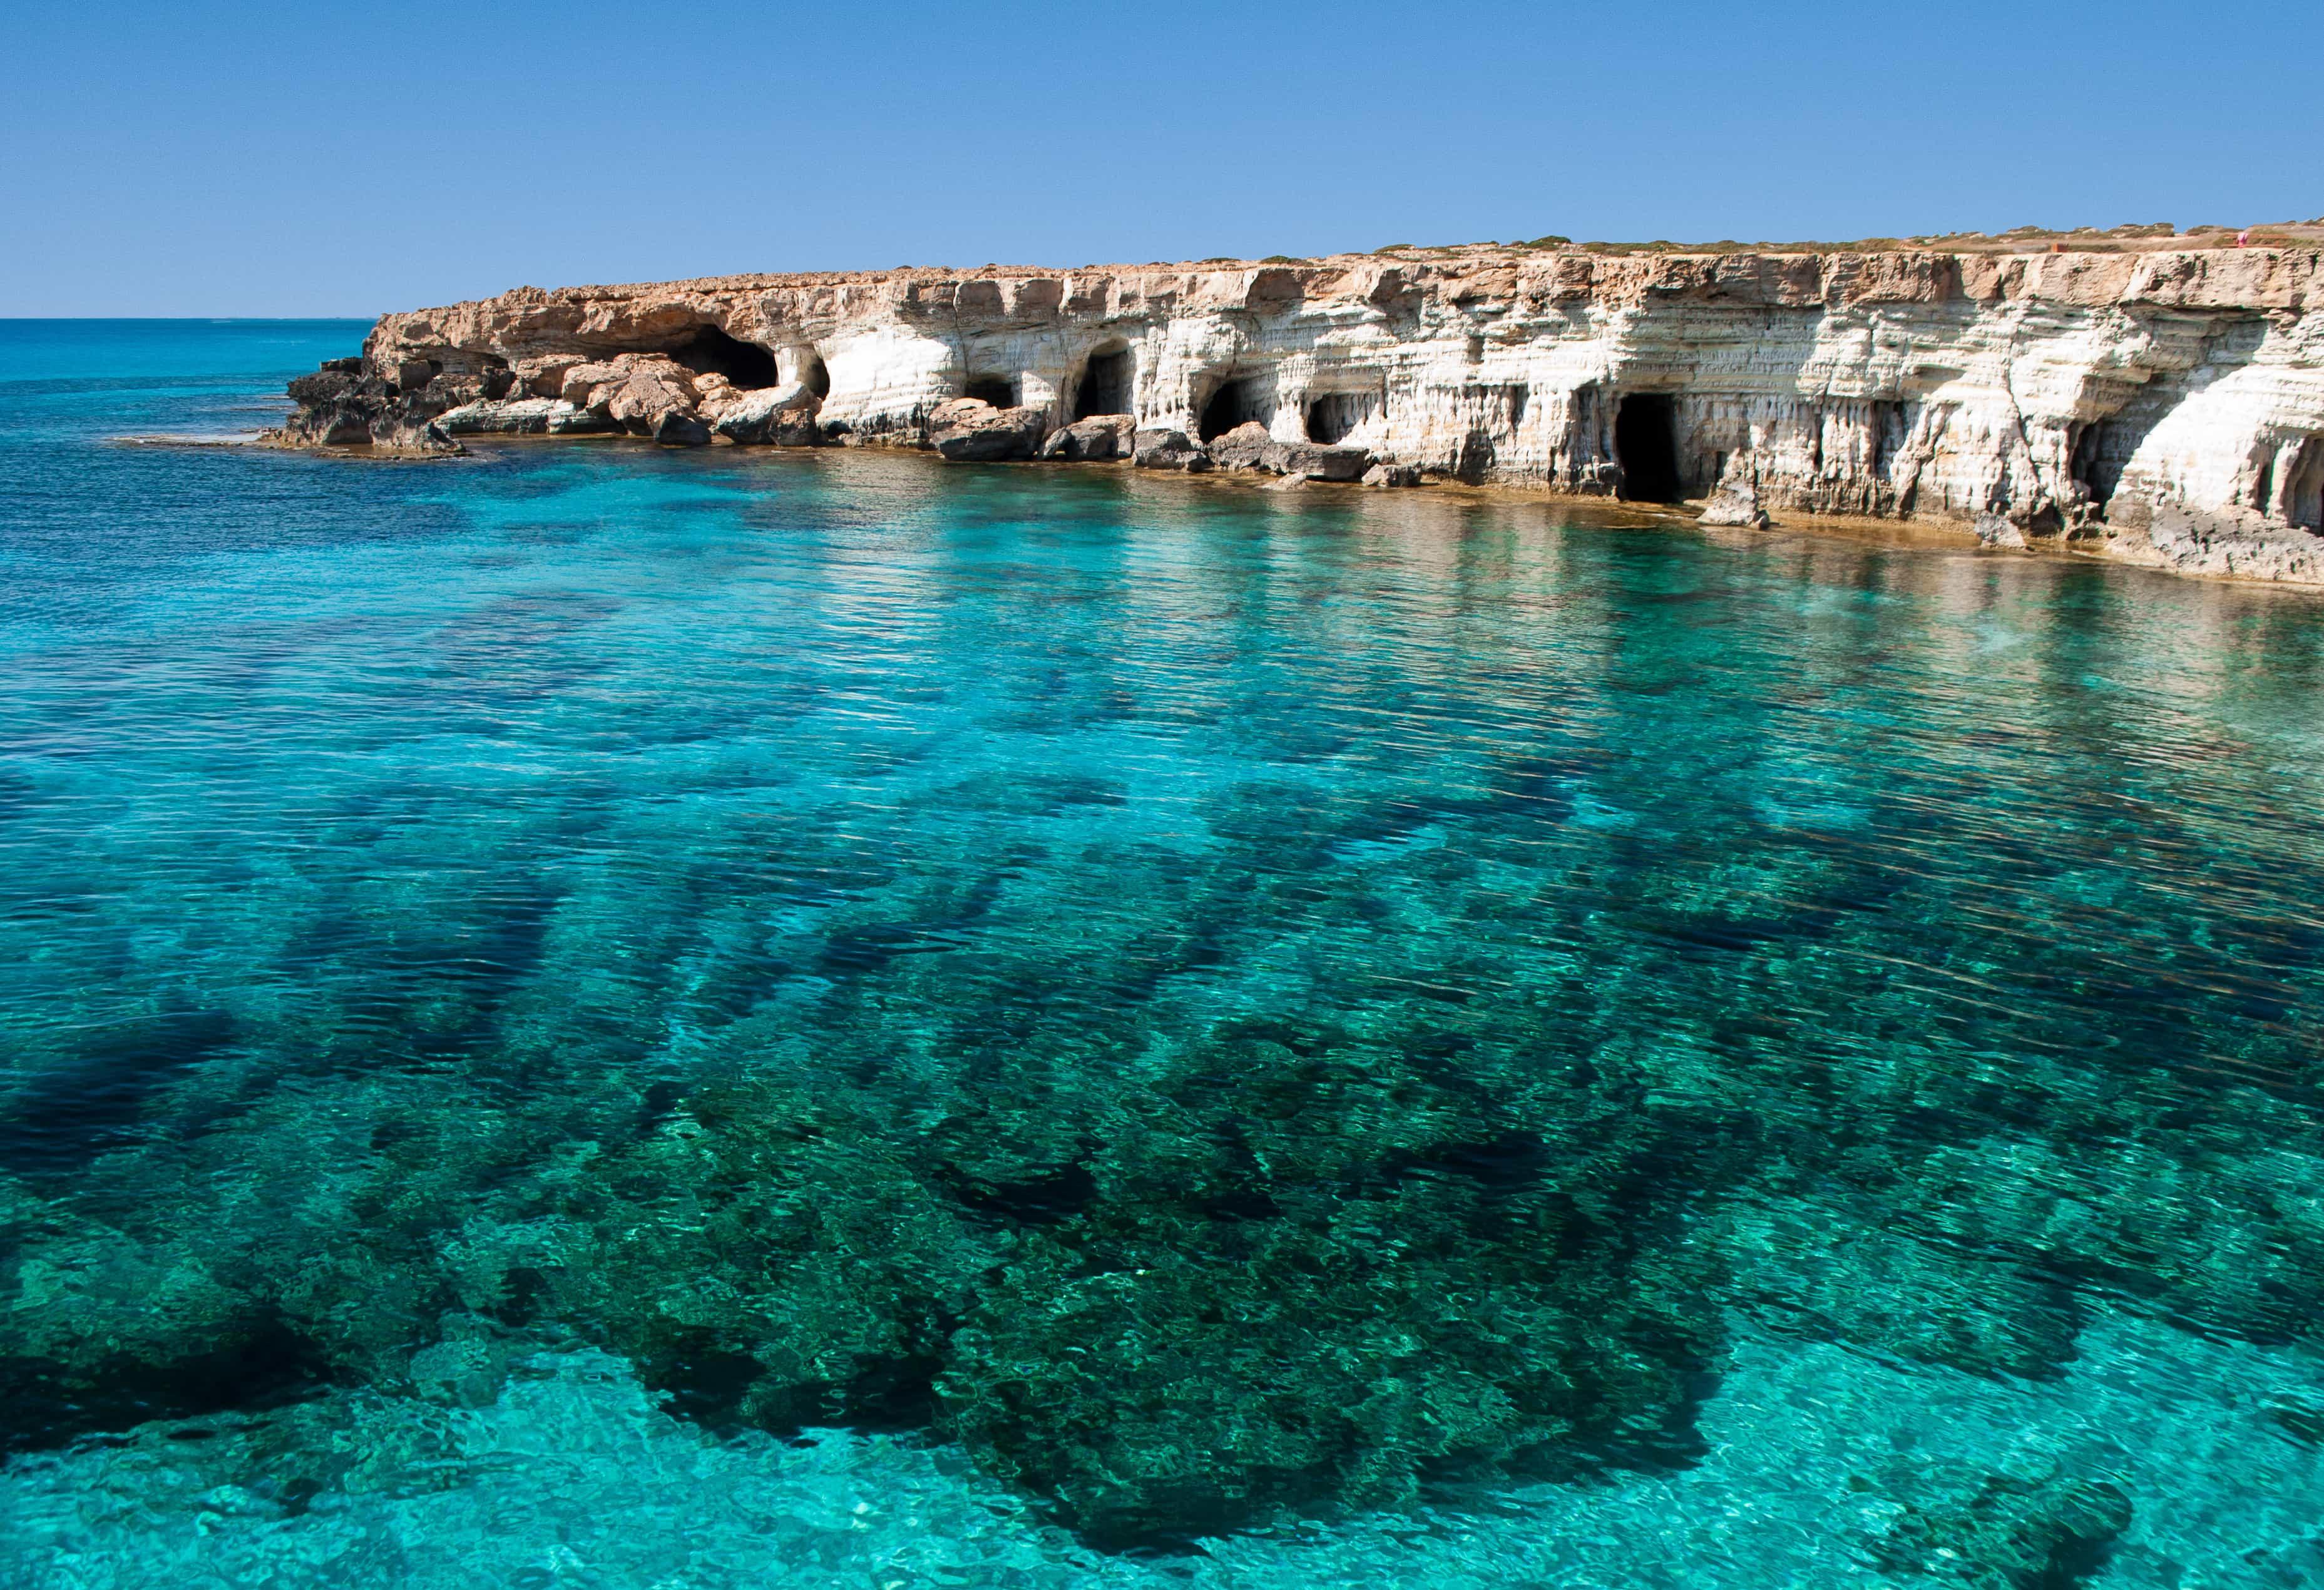 blue lagoon in Cyprus with rock cliffs around